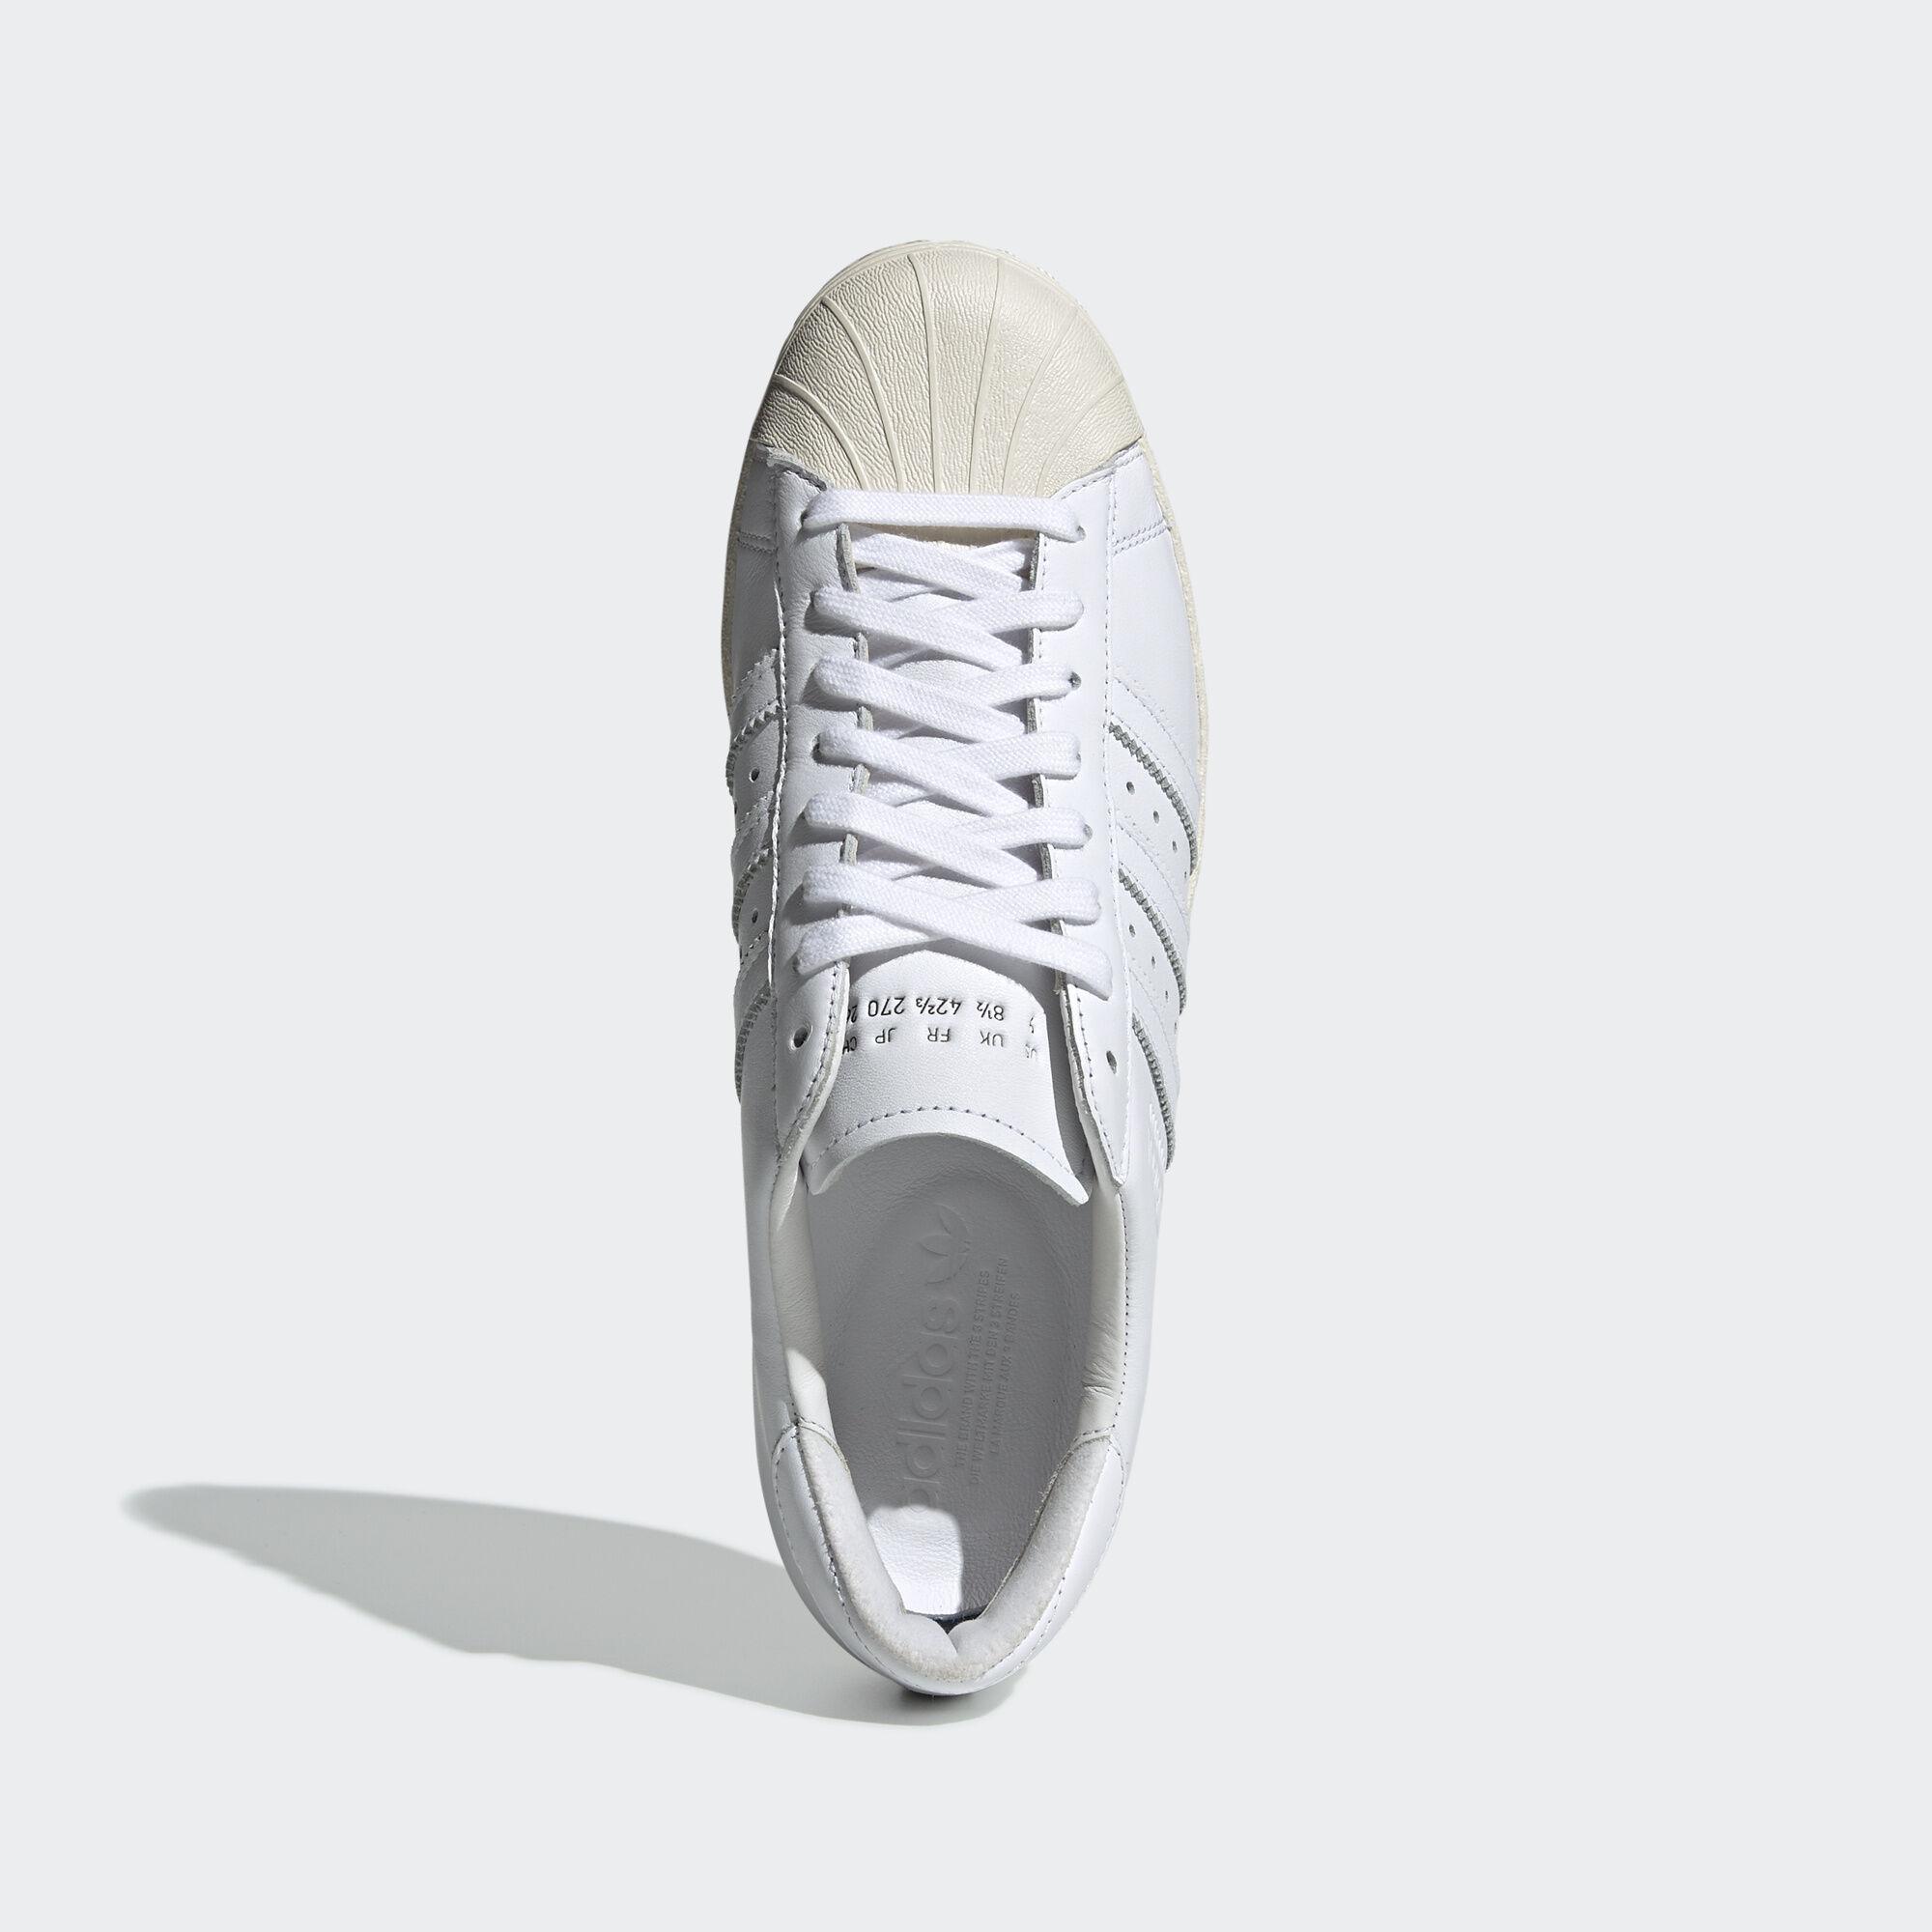 Adidas Superstar 80s EE7392